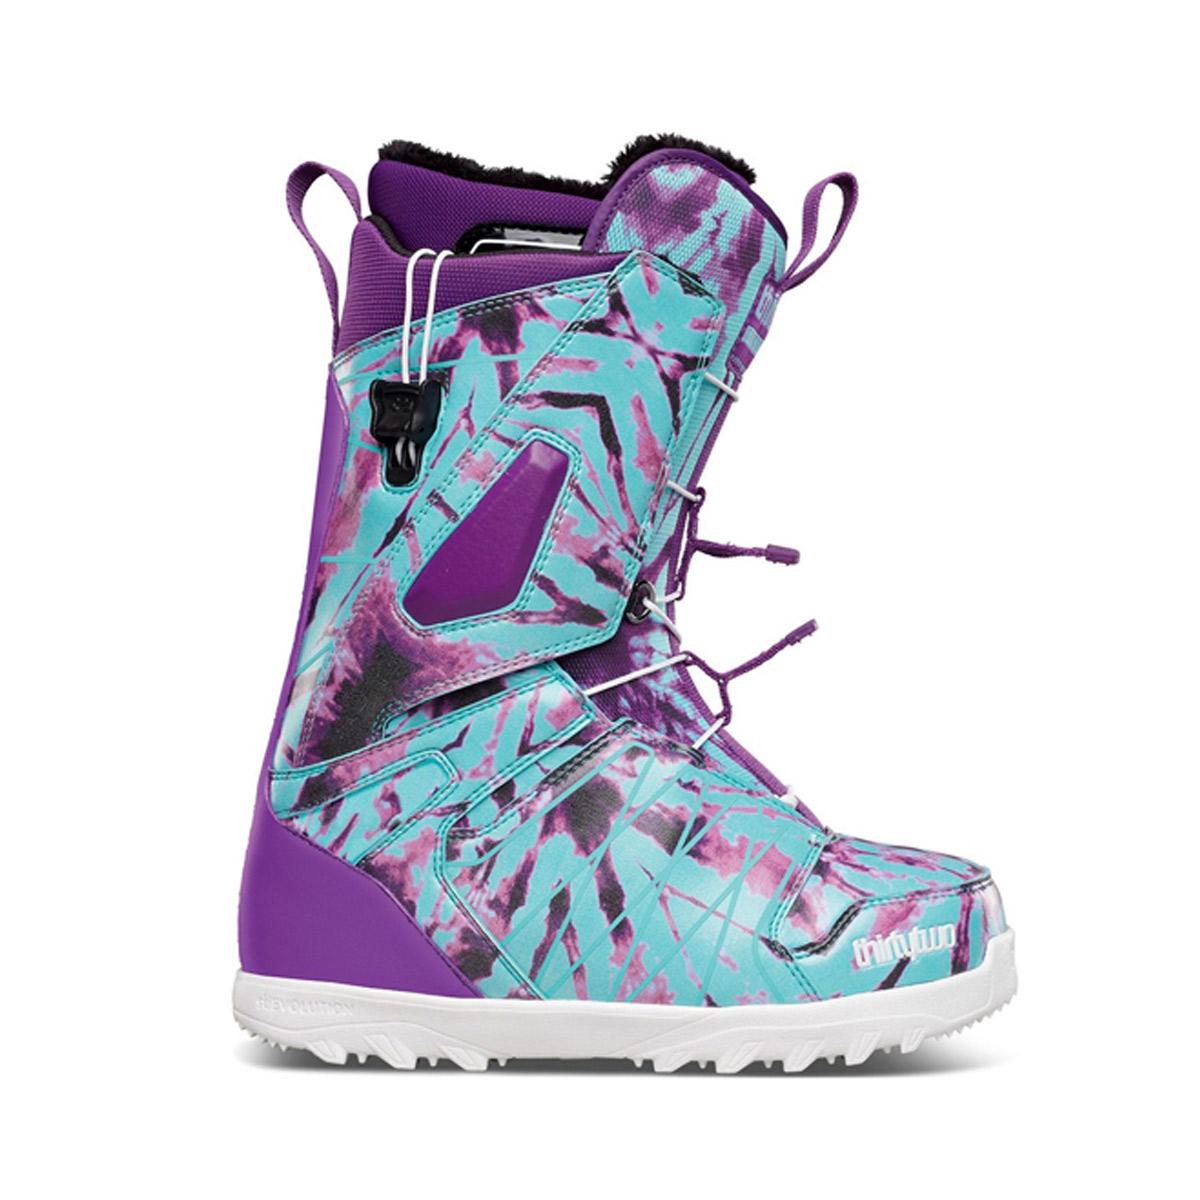 Ботинки для сноуборда THIRTYTWO Z Lashed  2017